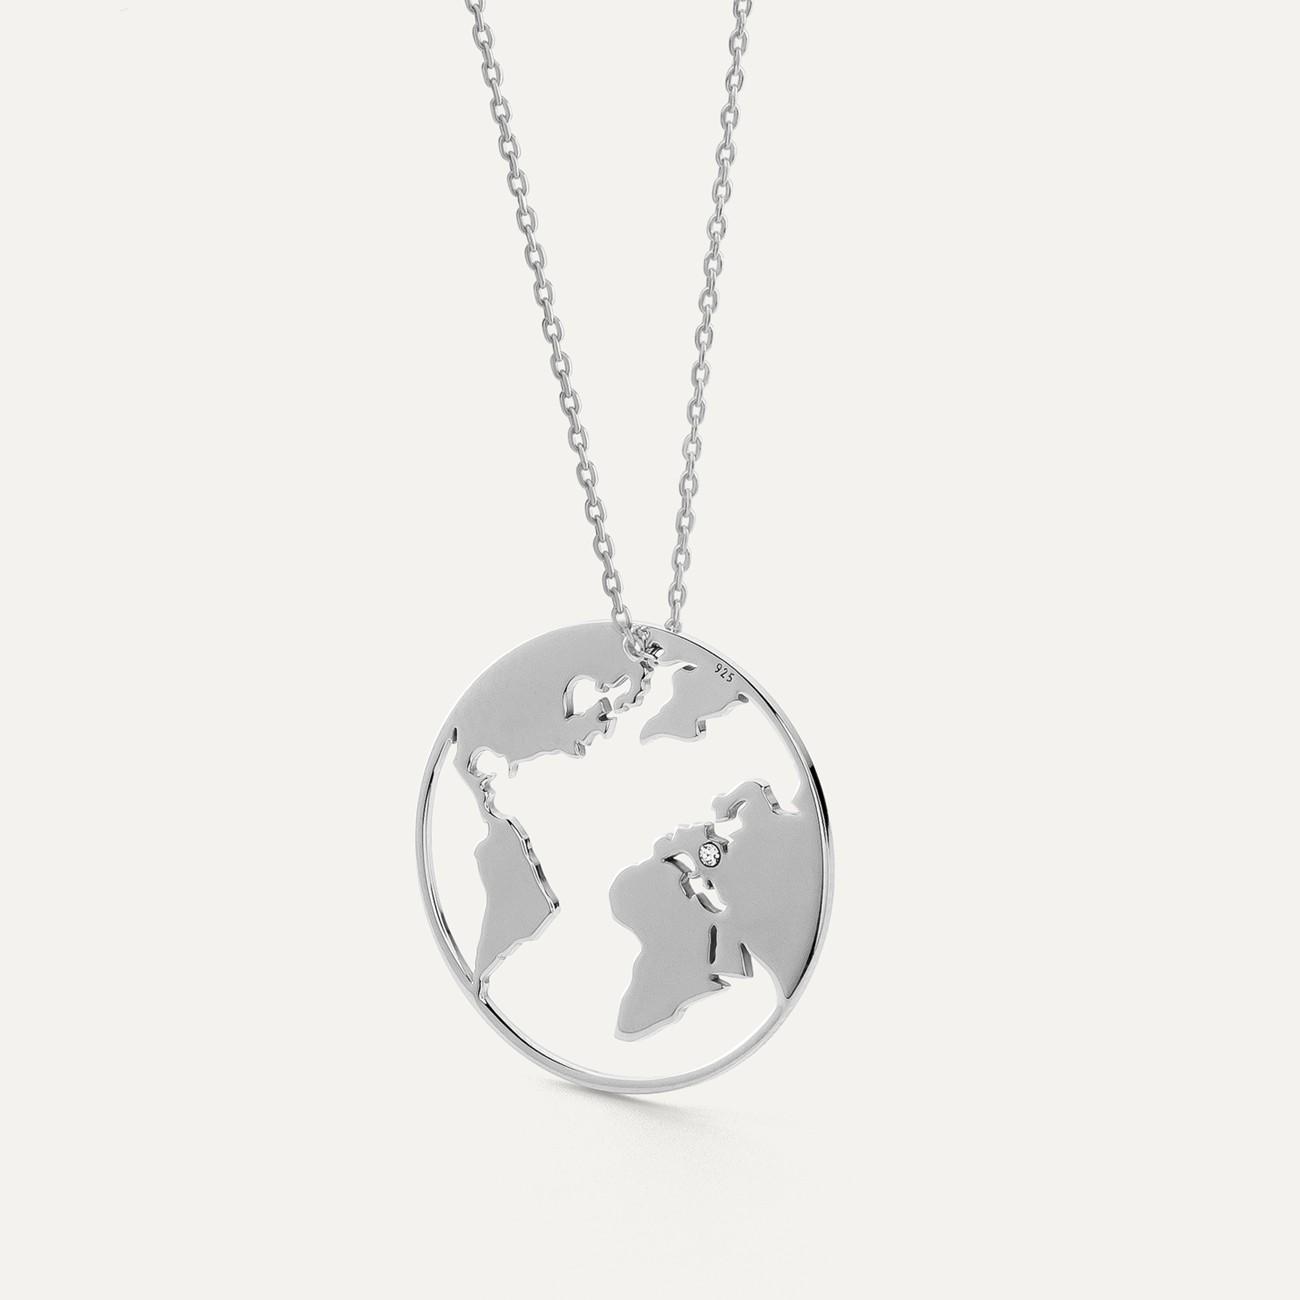 Heart necklace silver 925 swarovski crystals engraved